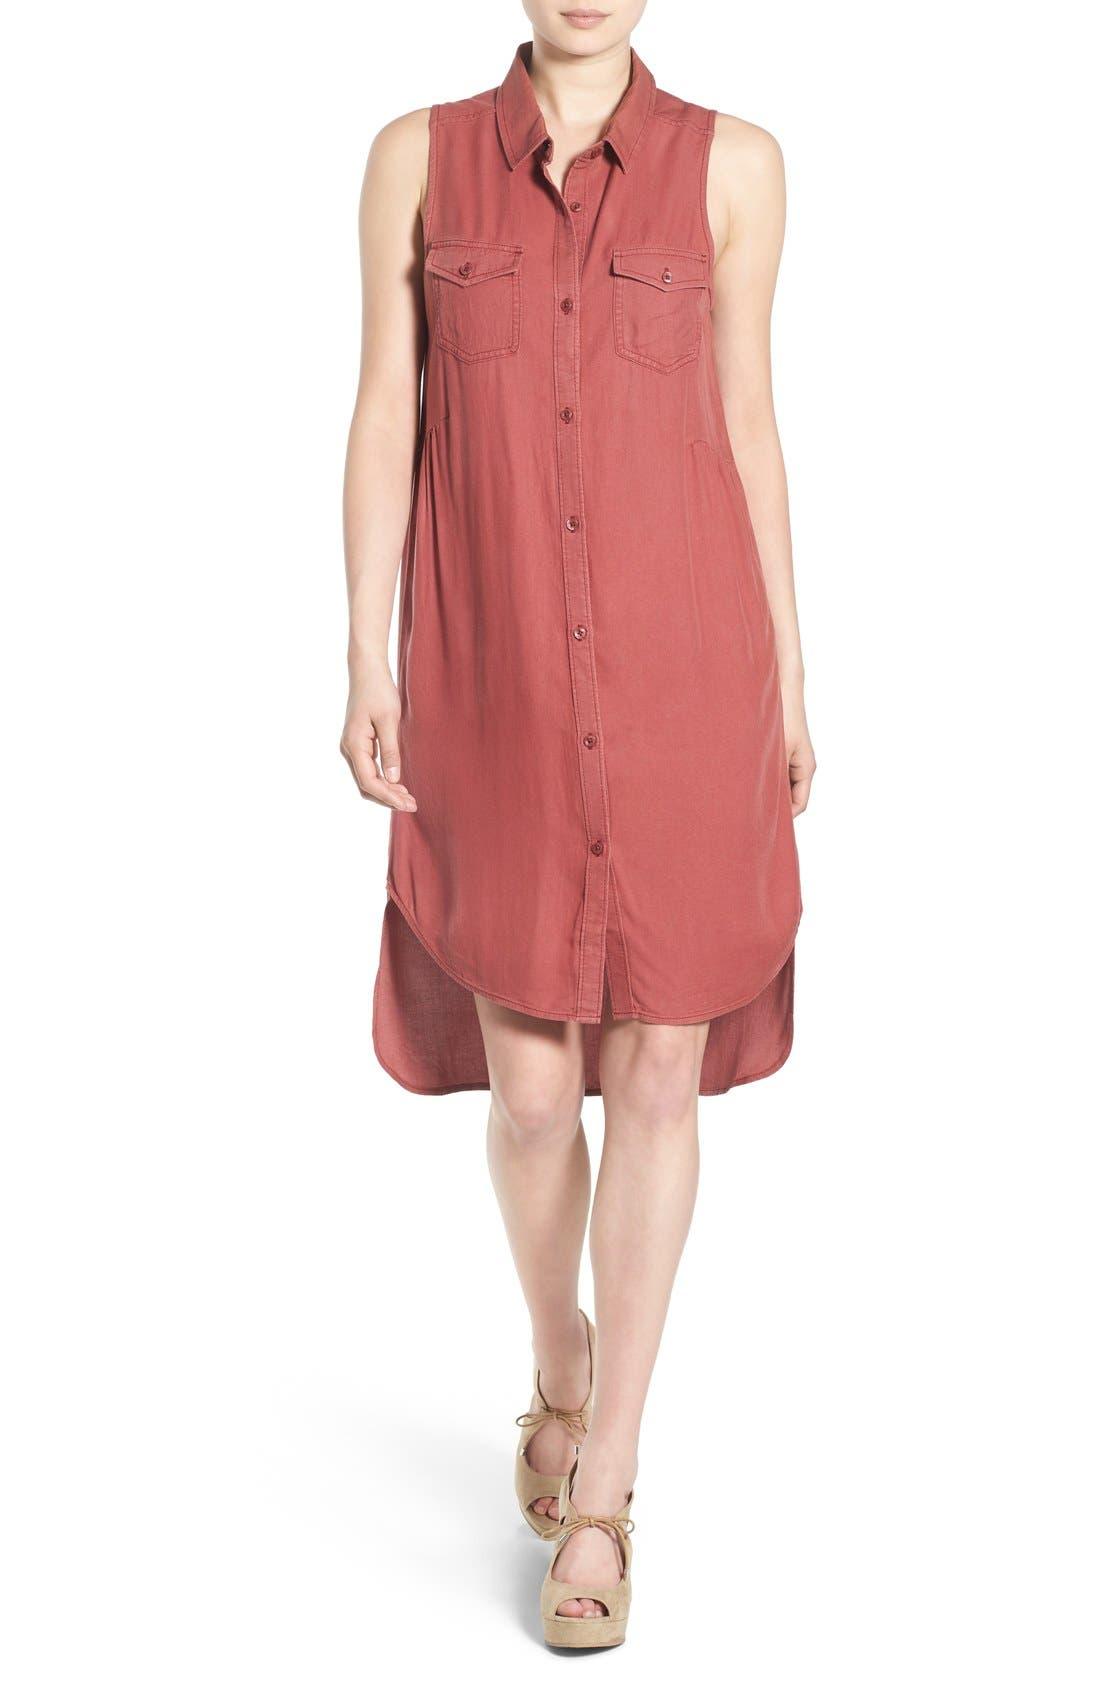 Alternate Image 1 Selected - BP. Sleeveless Woven Shirtdress